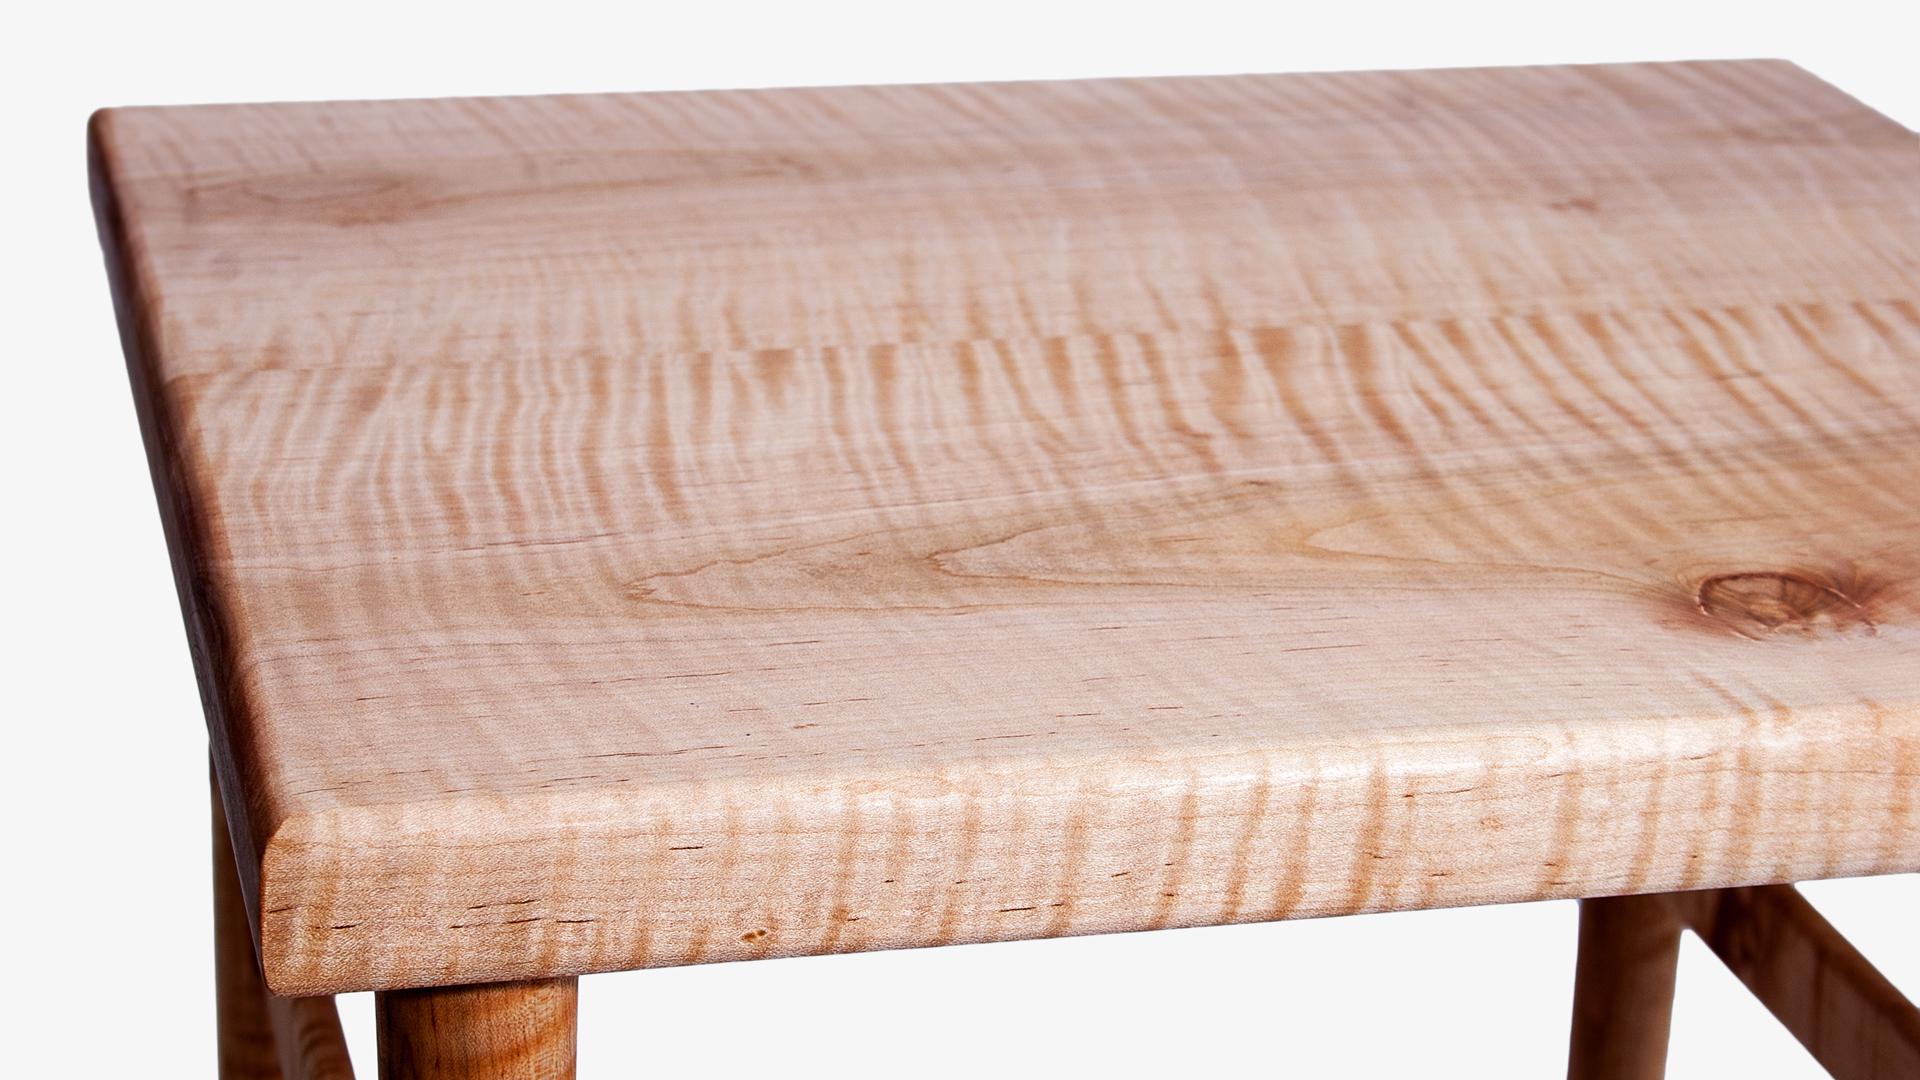 Curly Maple Table Portfolio Presentation Light Grey17.jpg